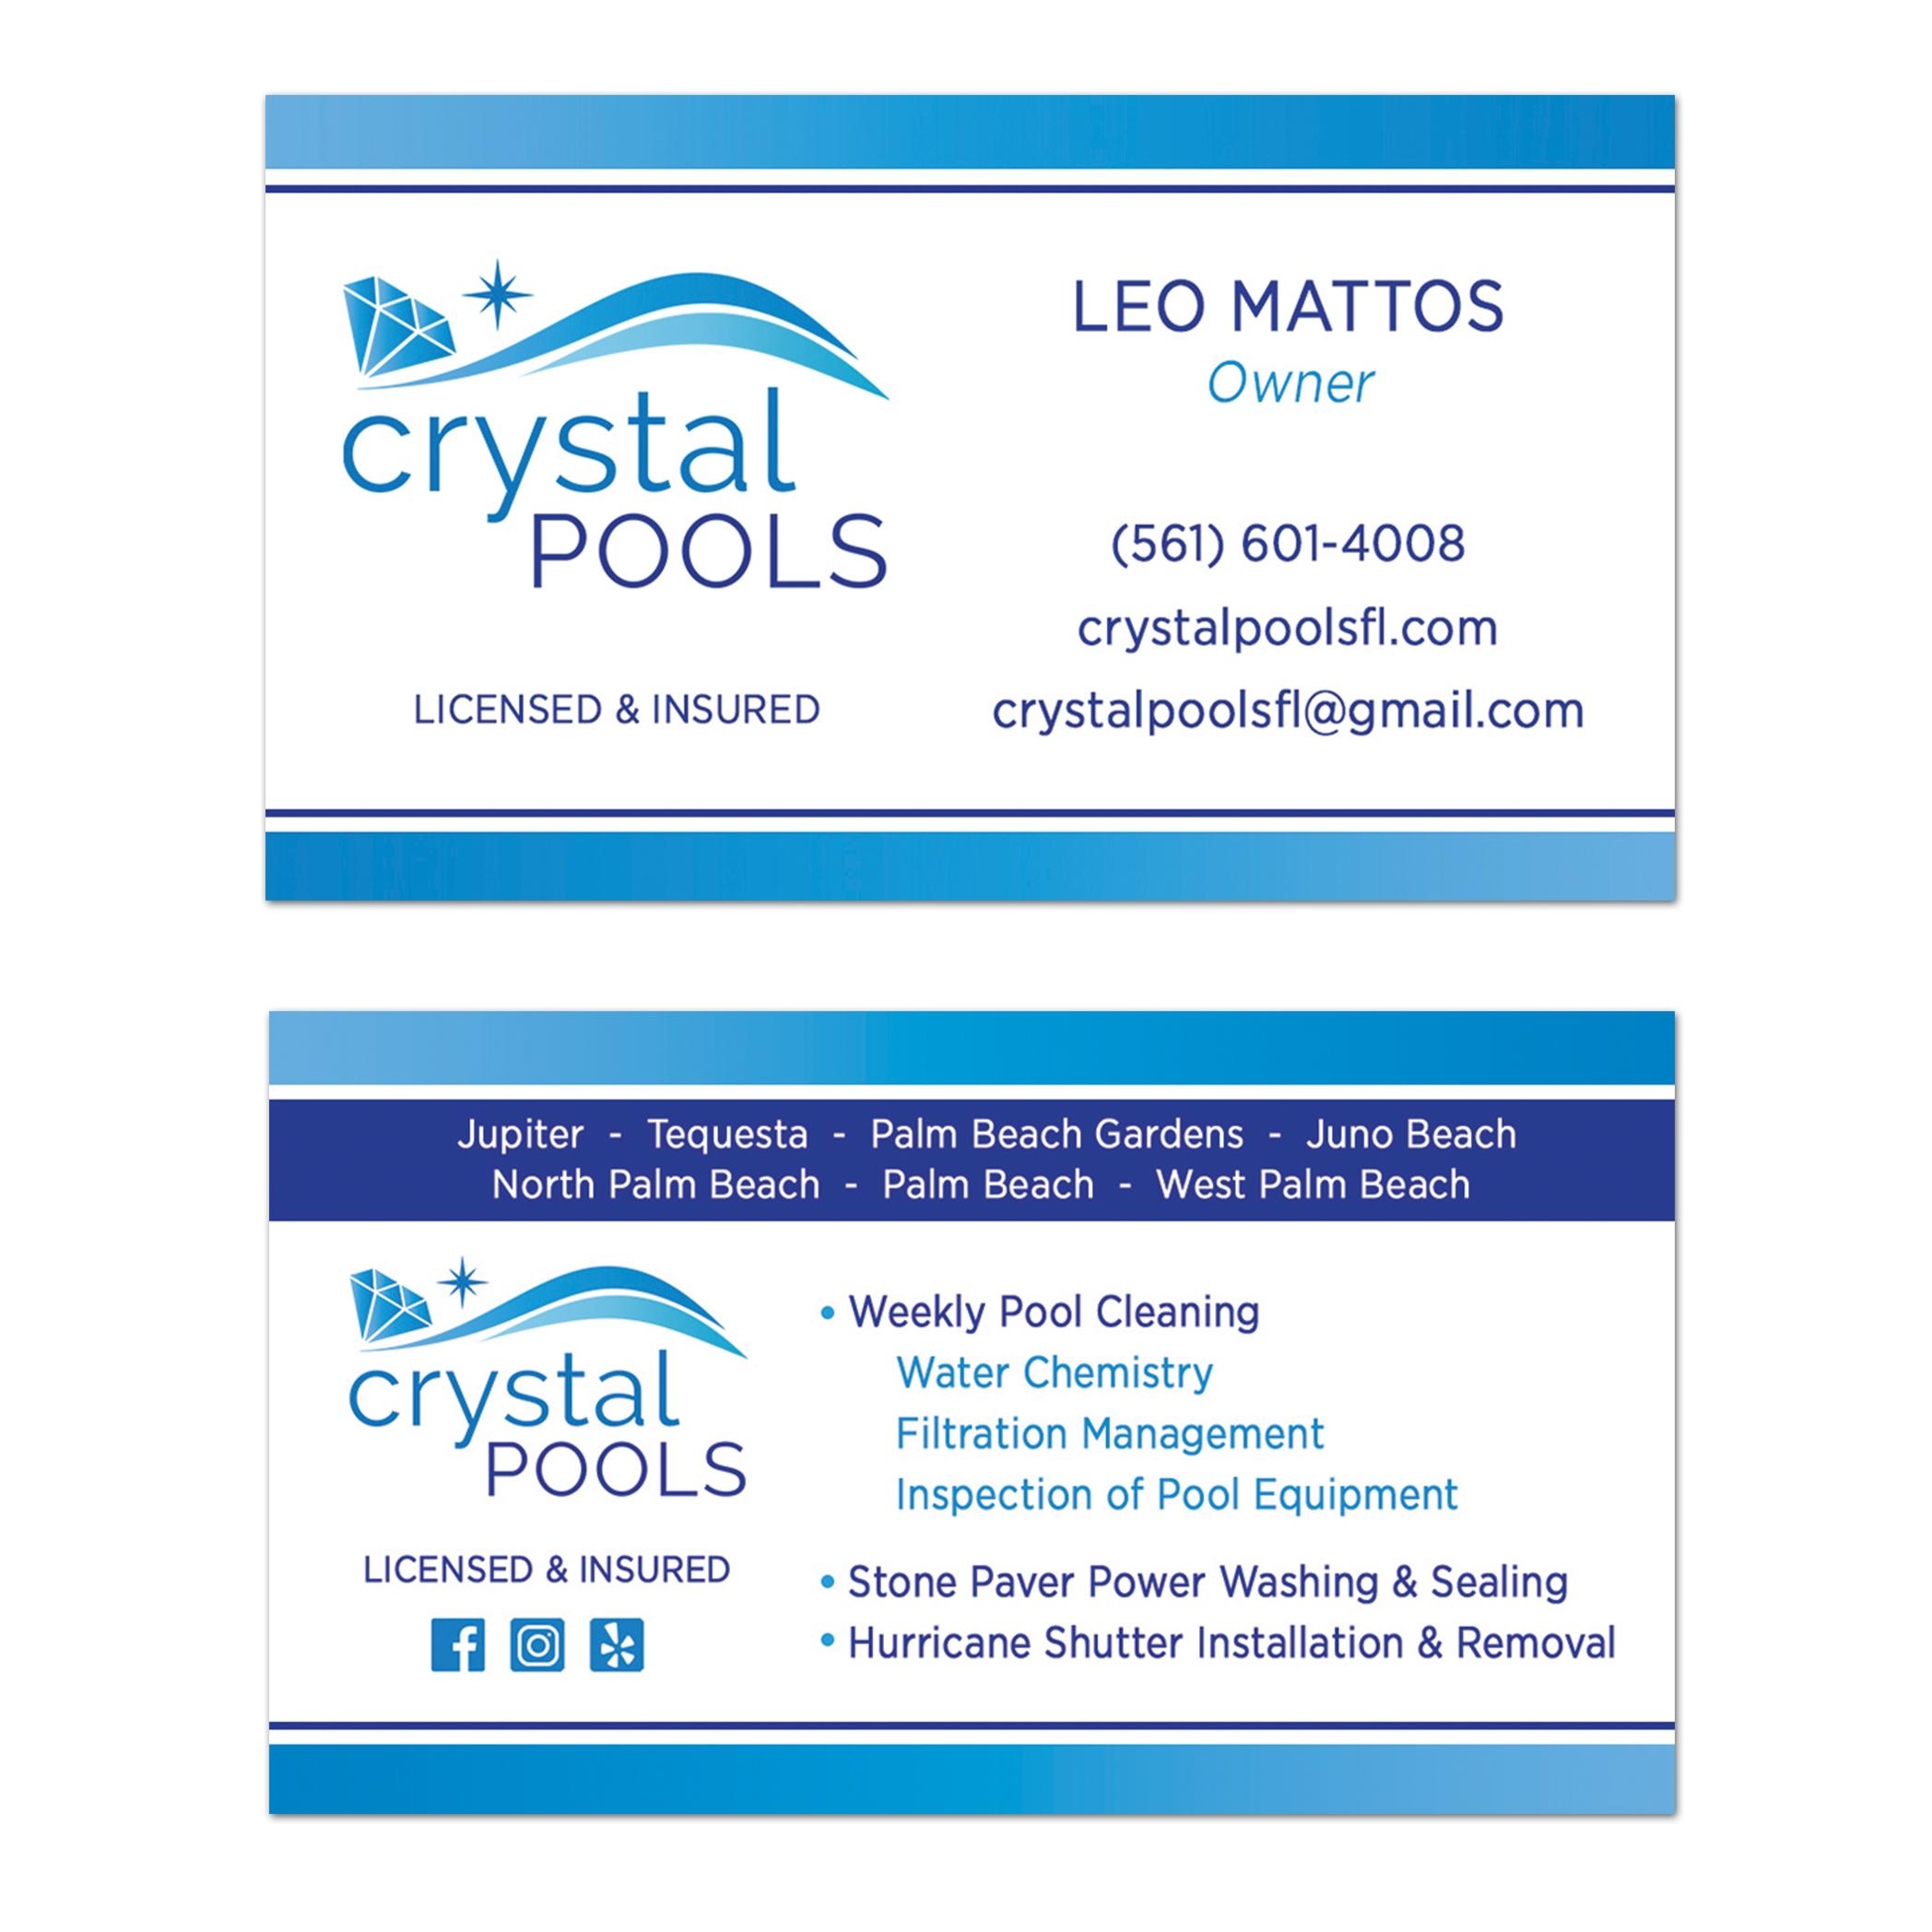 Crystal Pools Business Card Design